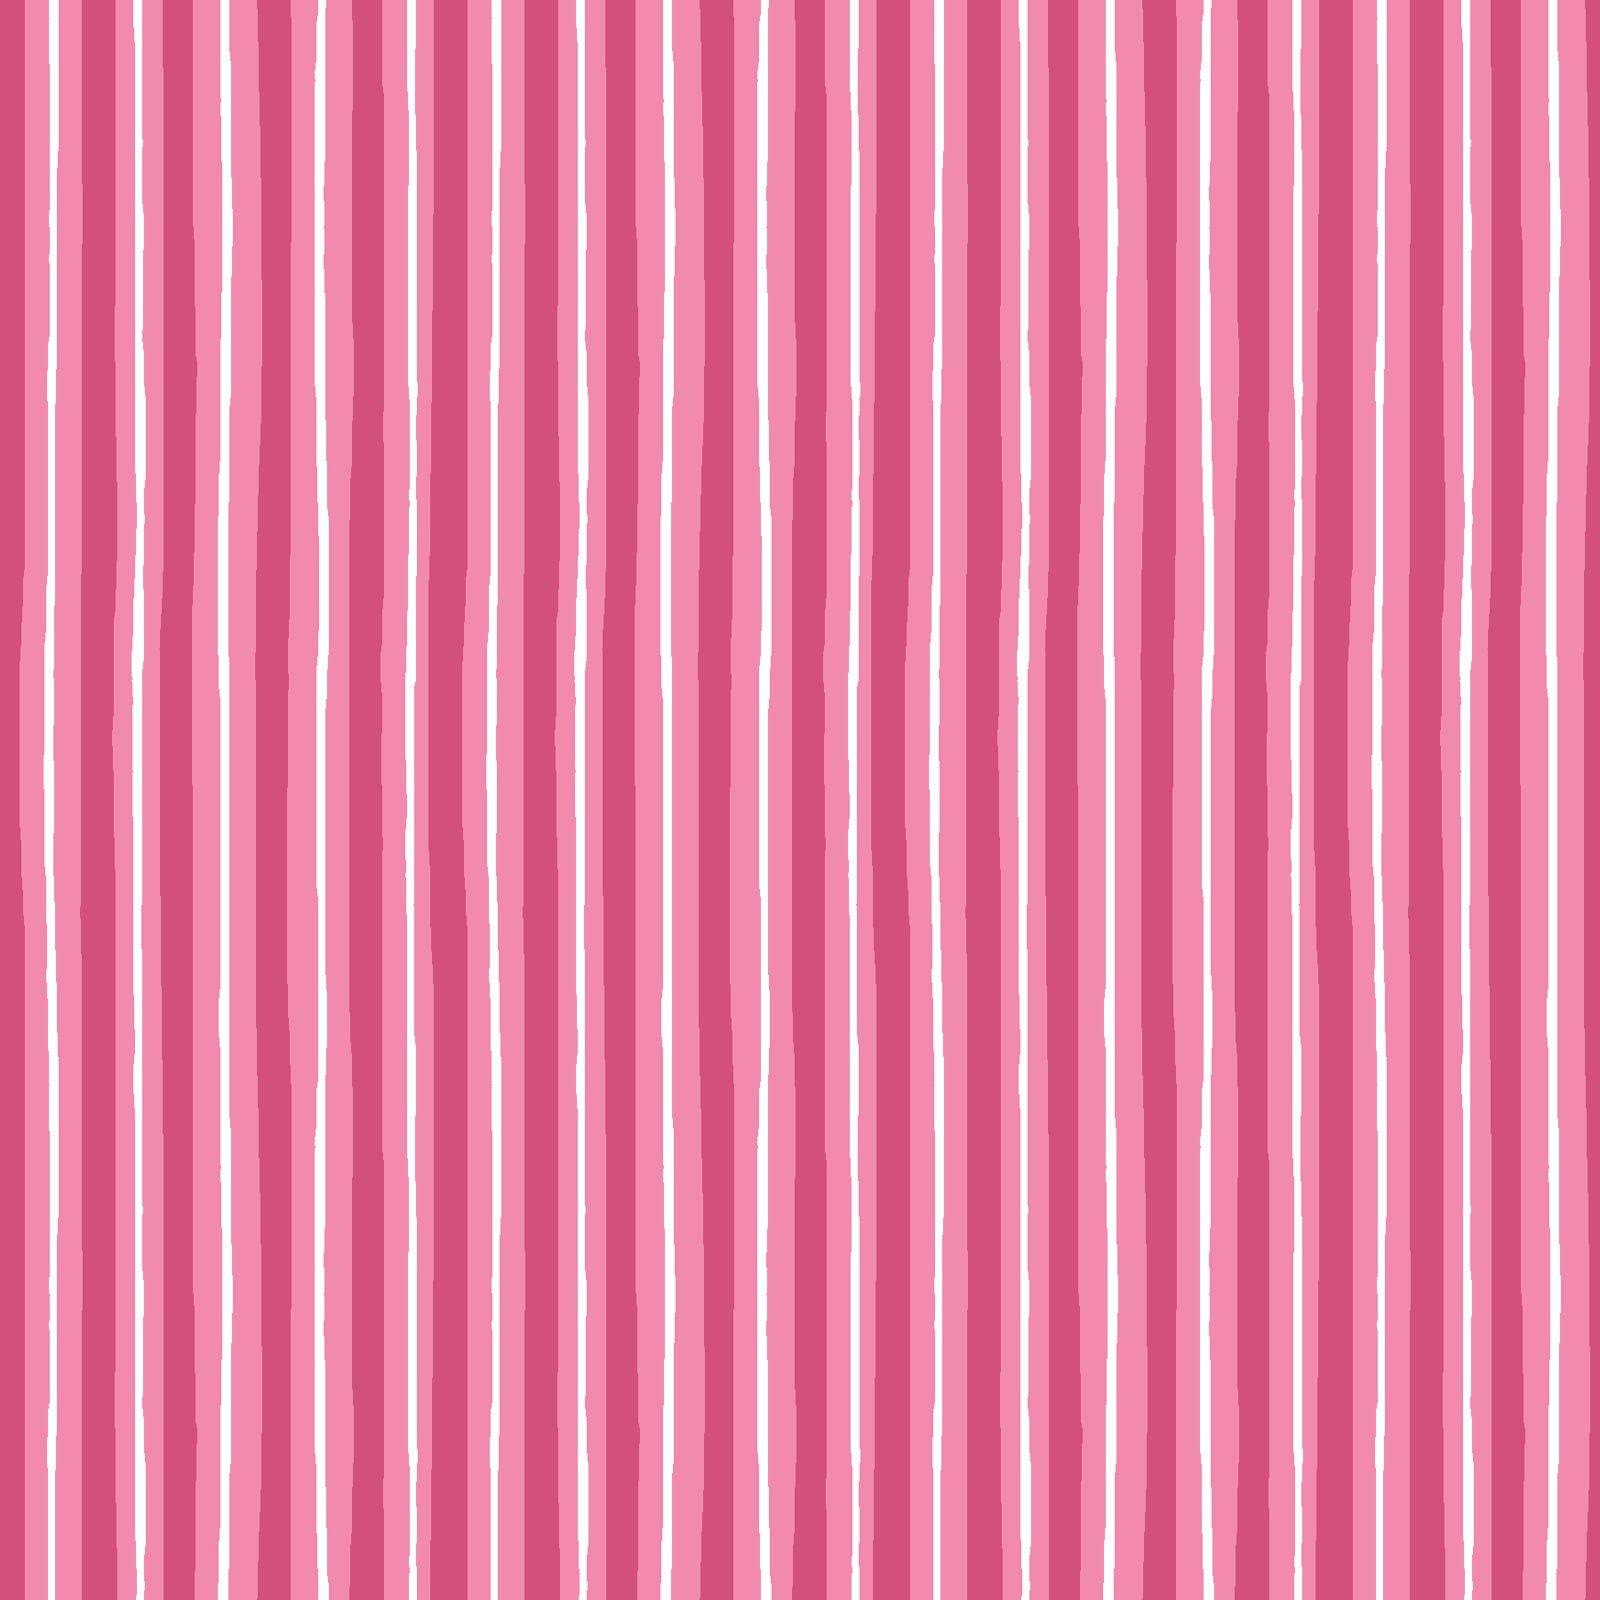 Kimberbell Basics Pink Stripe MAS8242-P